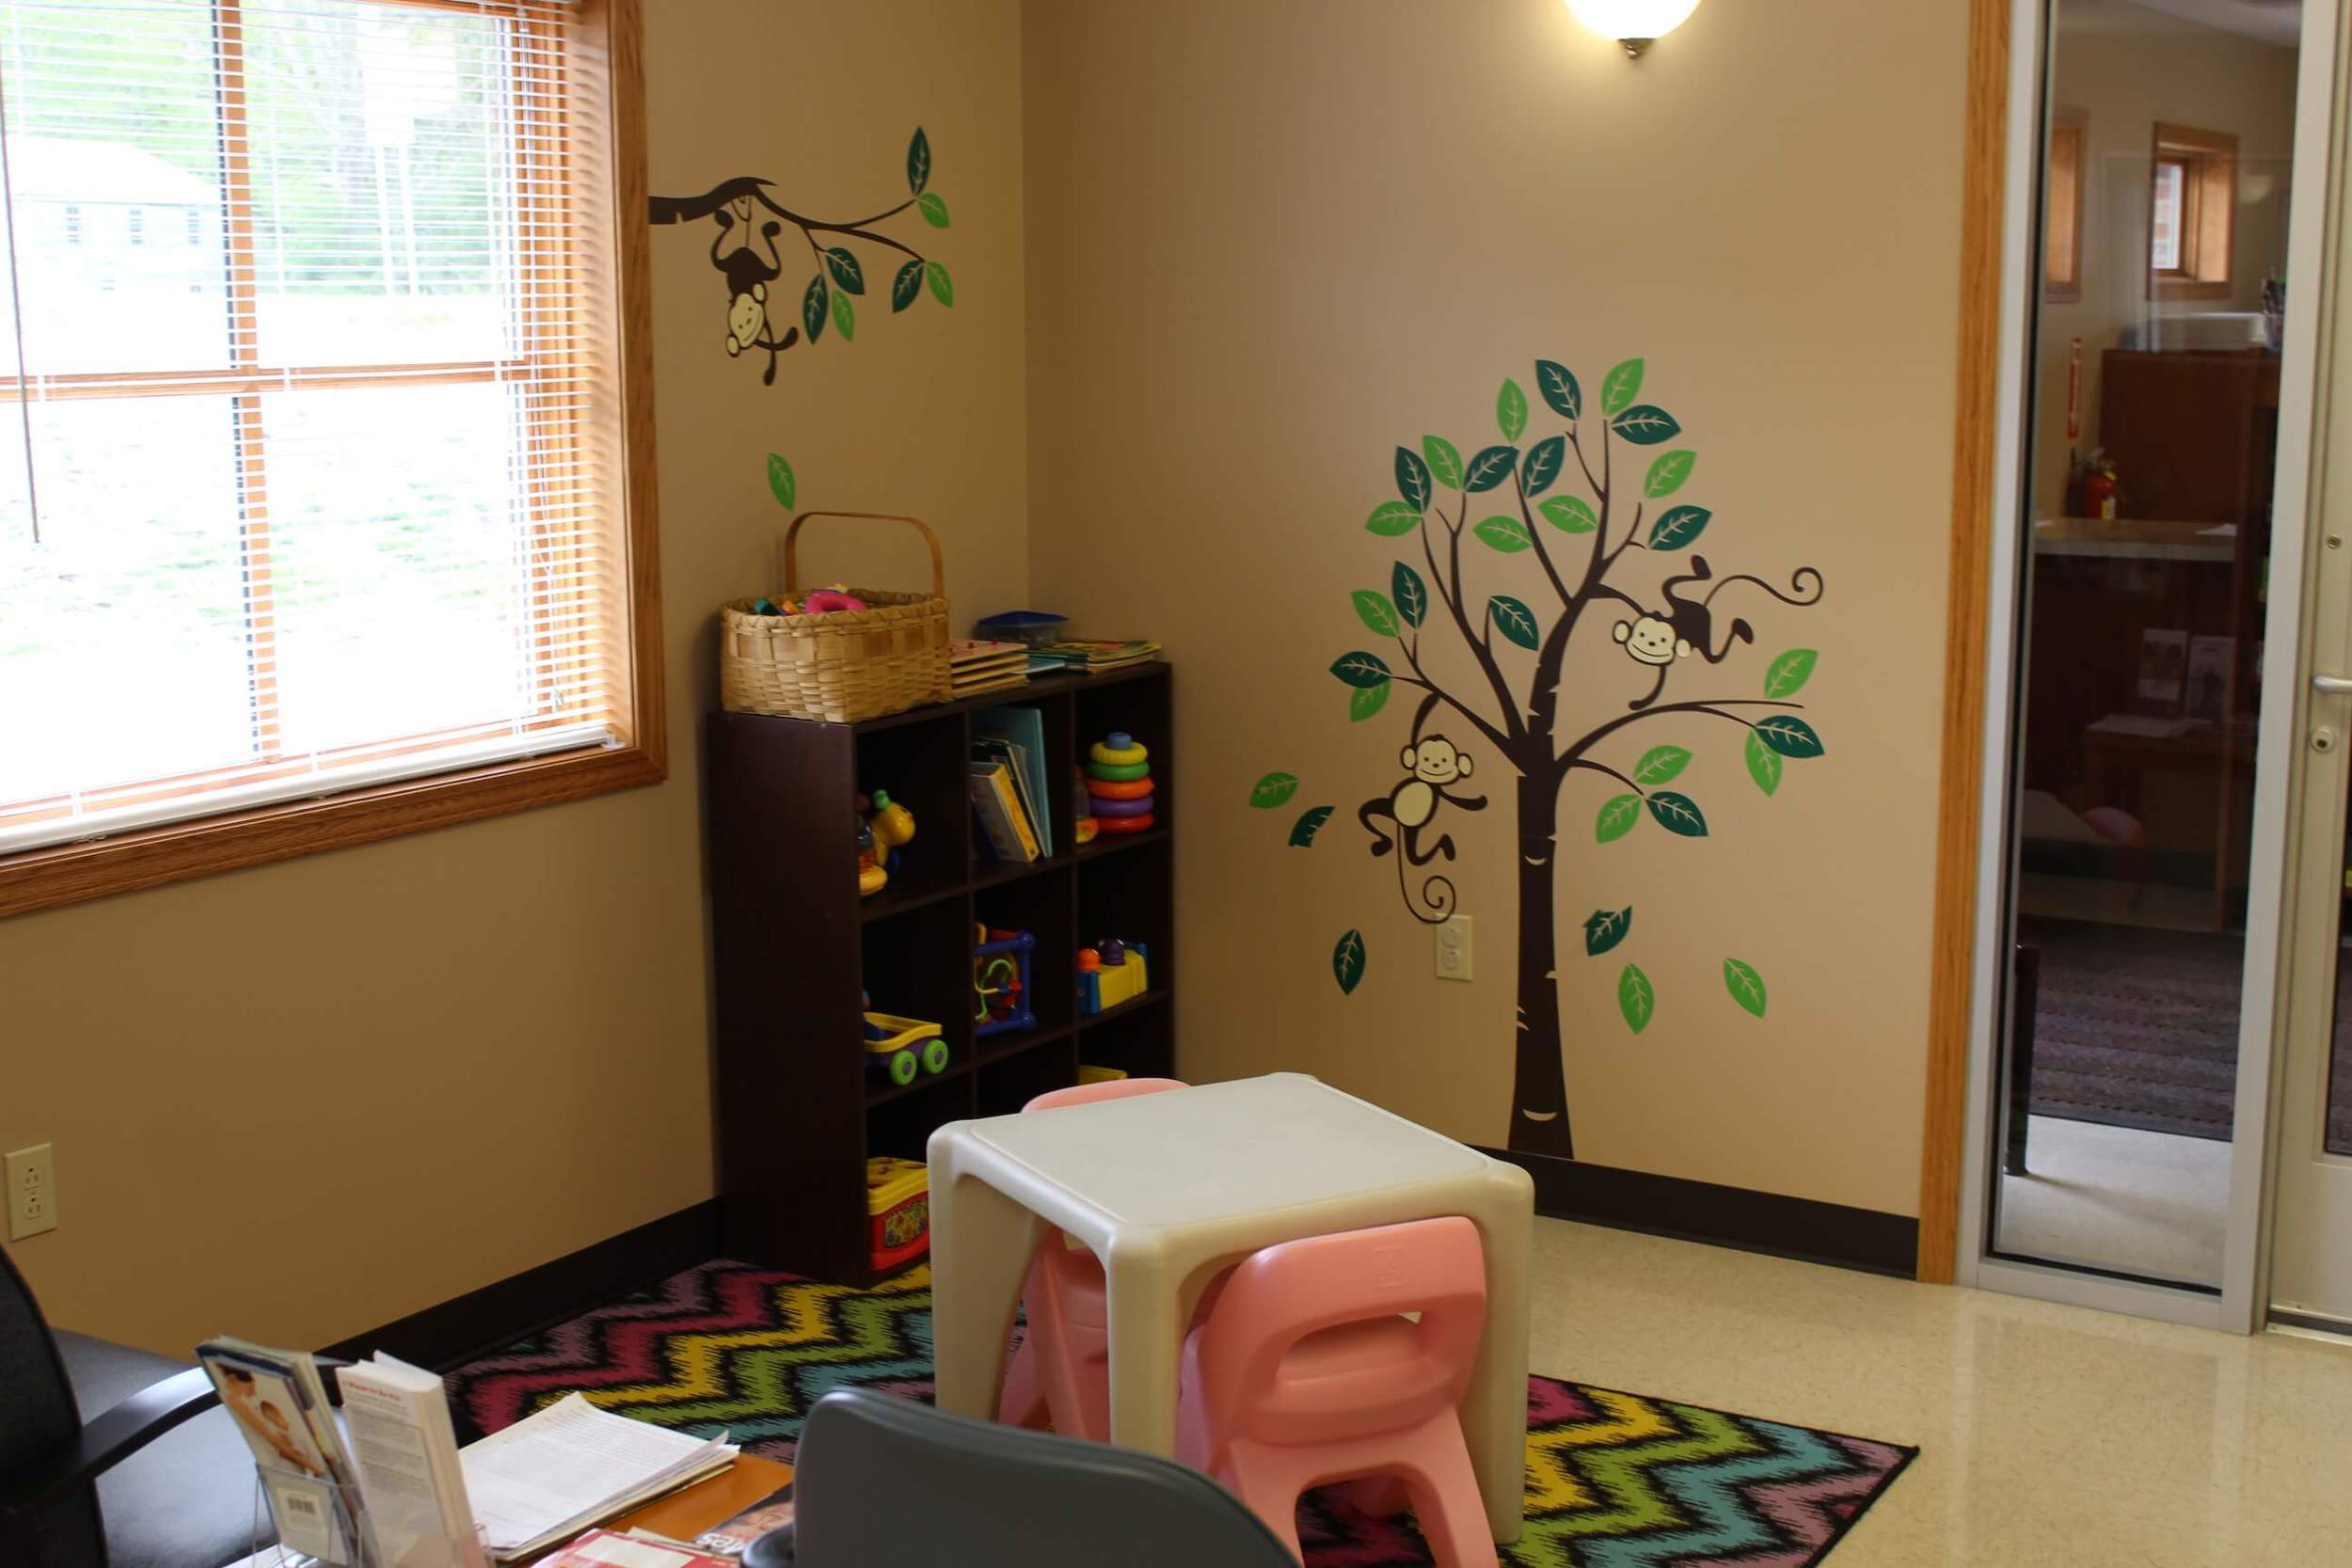 Harman WV Exam Room Doctor Medical Health Pendleton Community Care